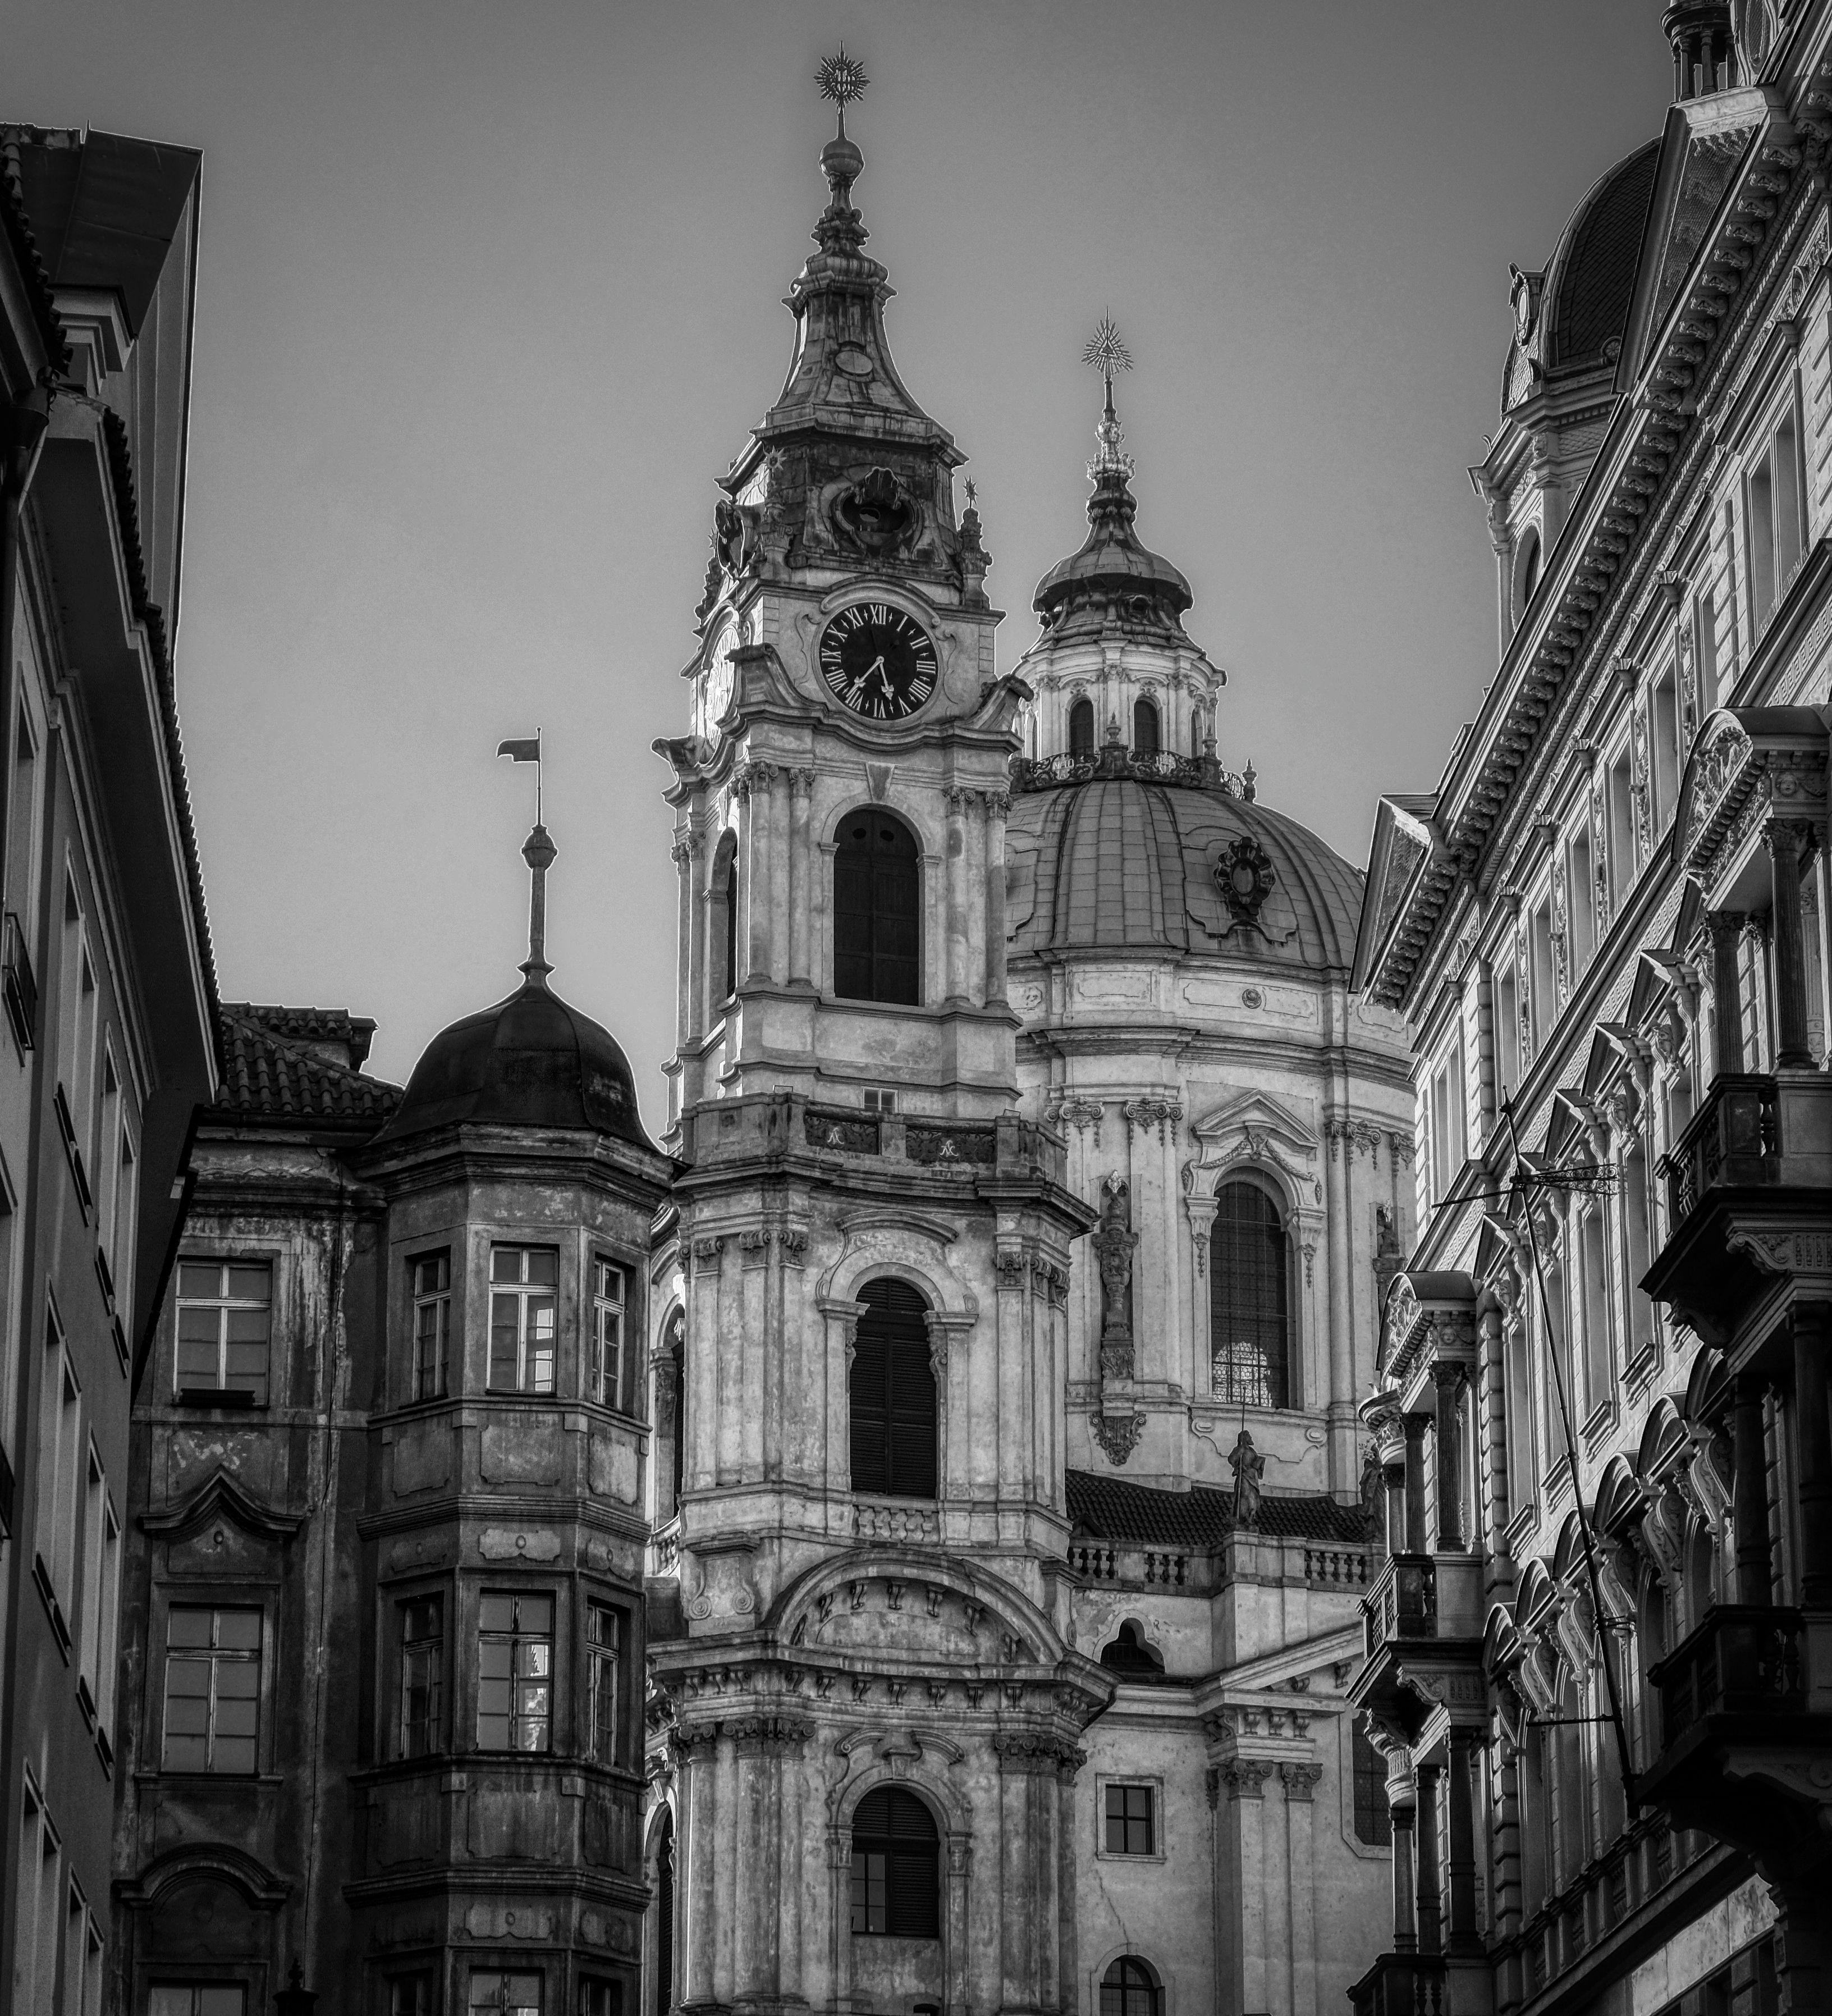 Kostel sv. Mikuláše – St Nicholas Church – St. Nikolaus